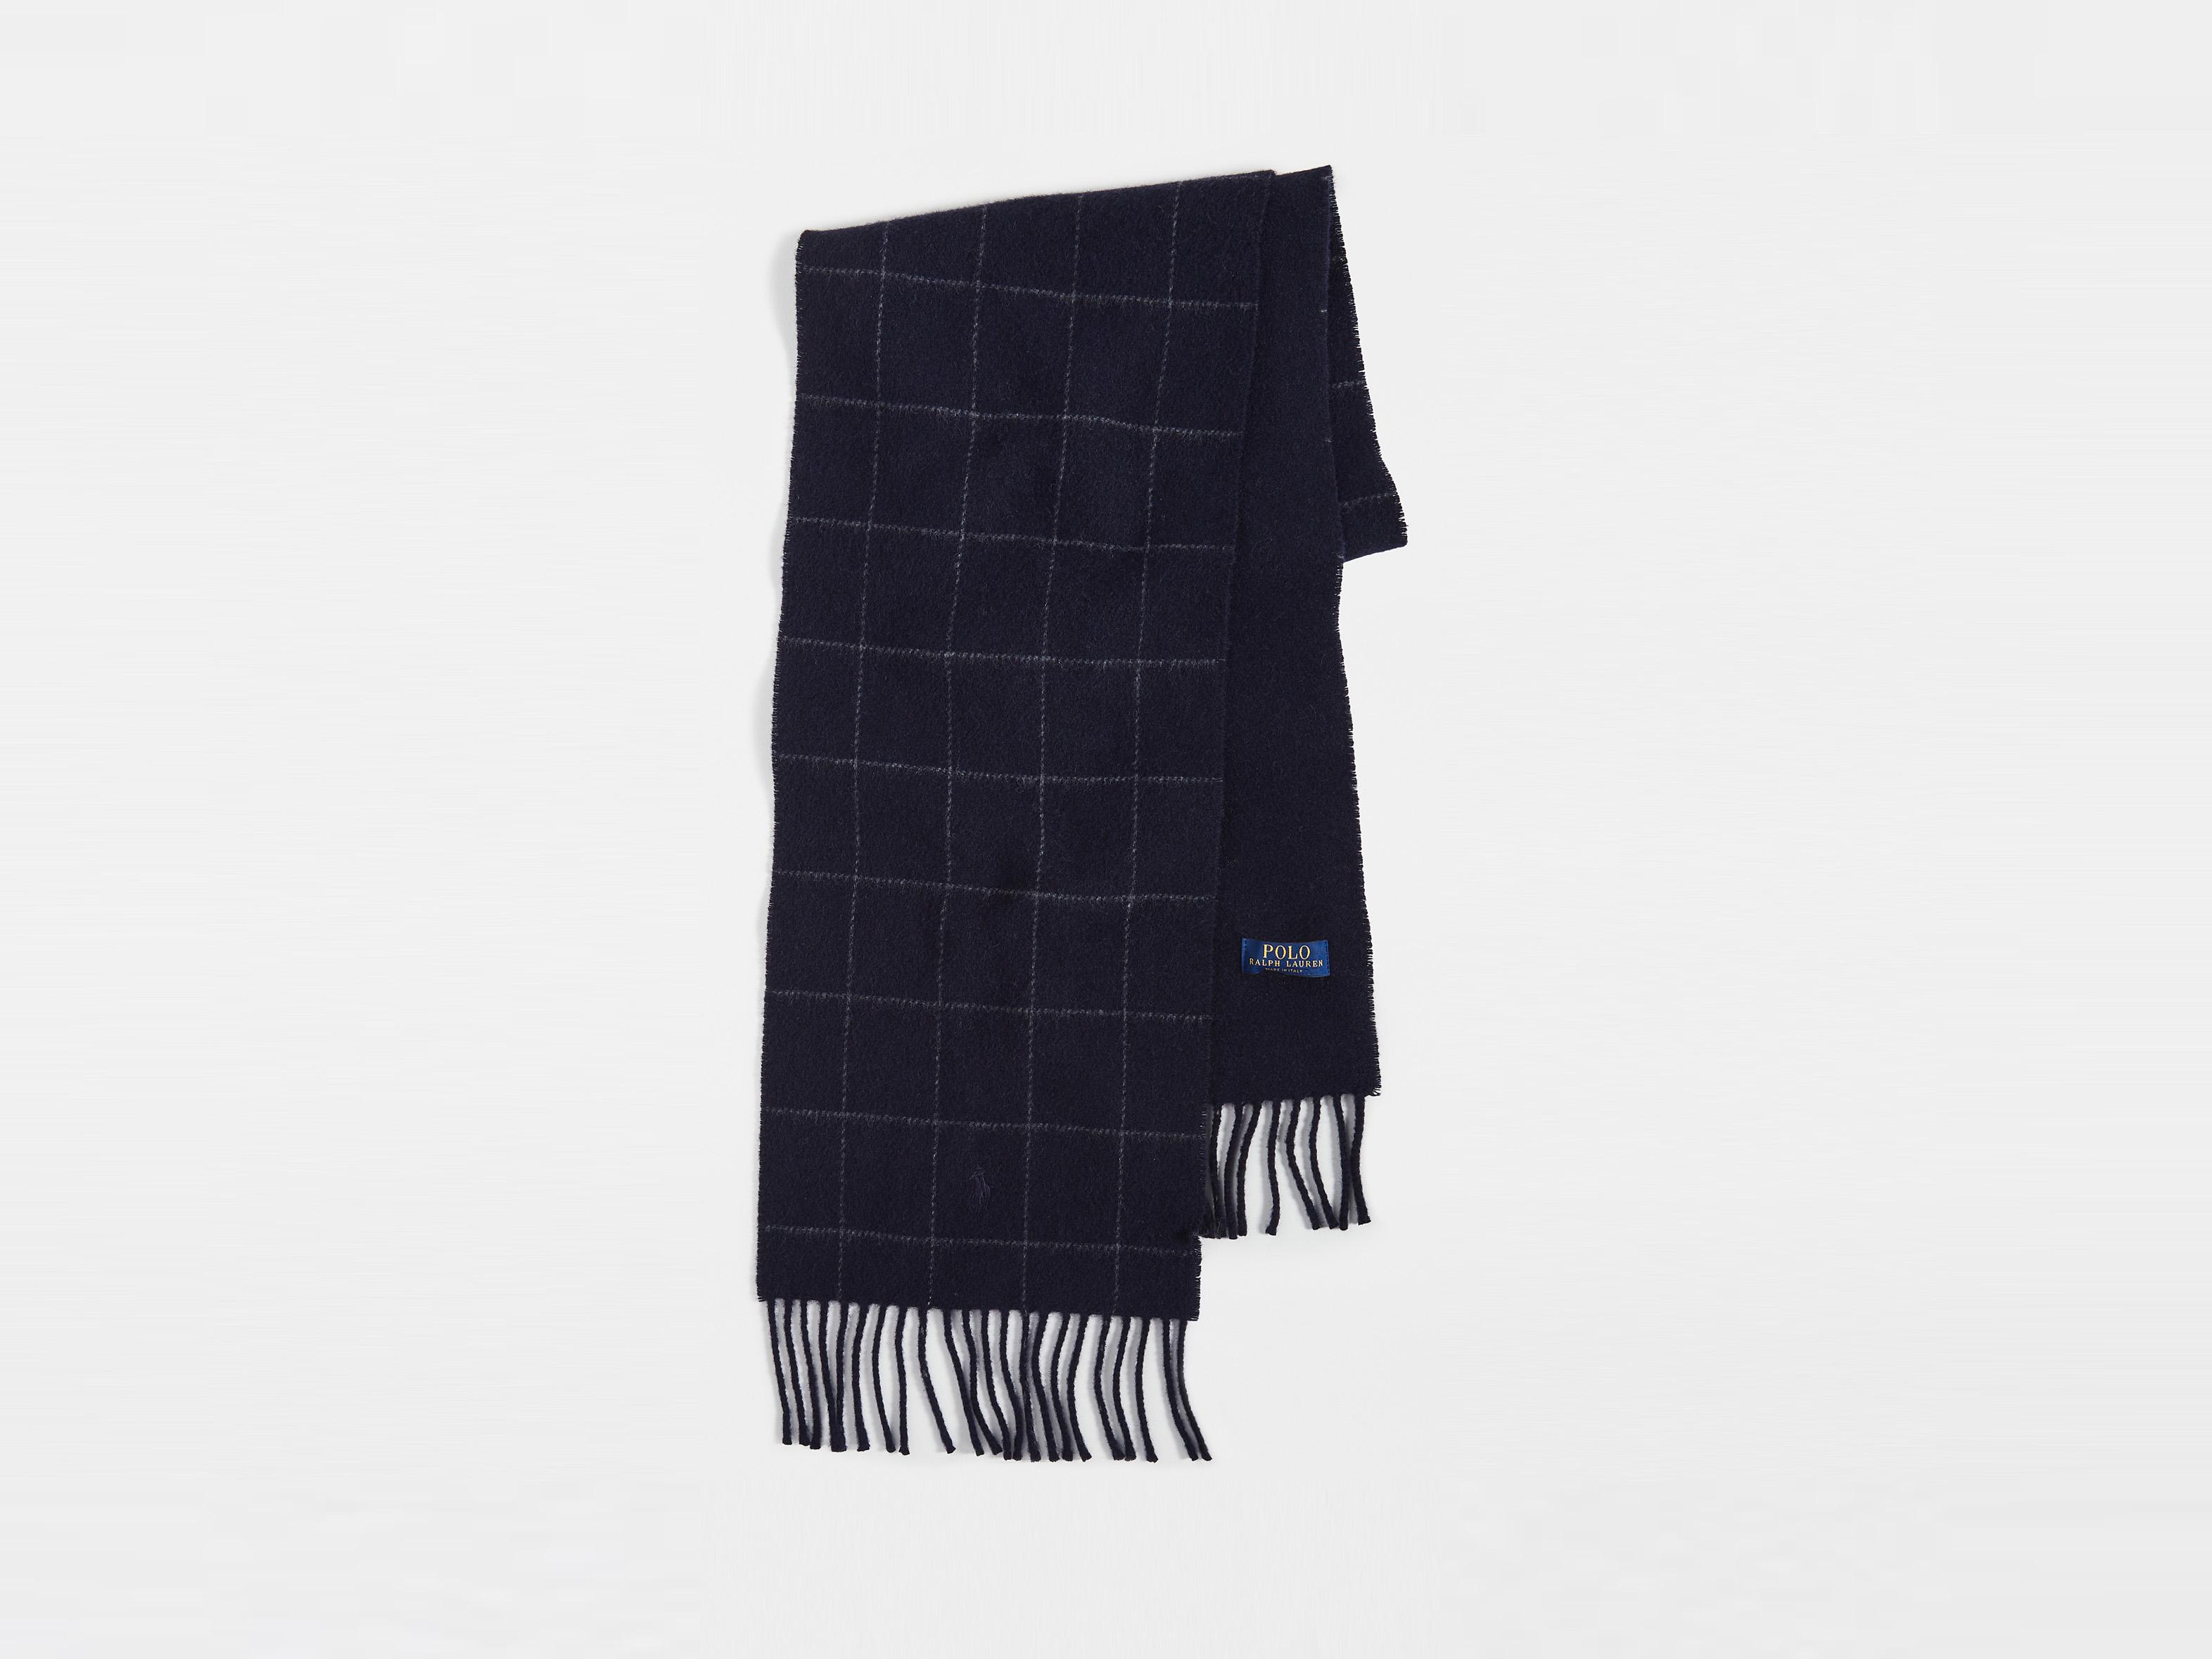 Best Winter Accessories - Polo Ralph Lauren Scarf